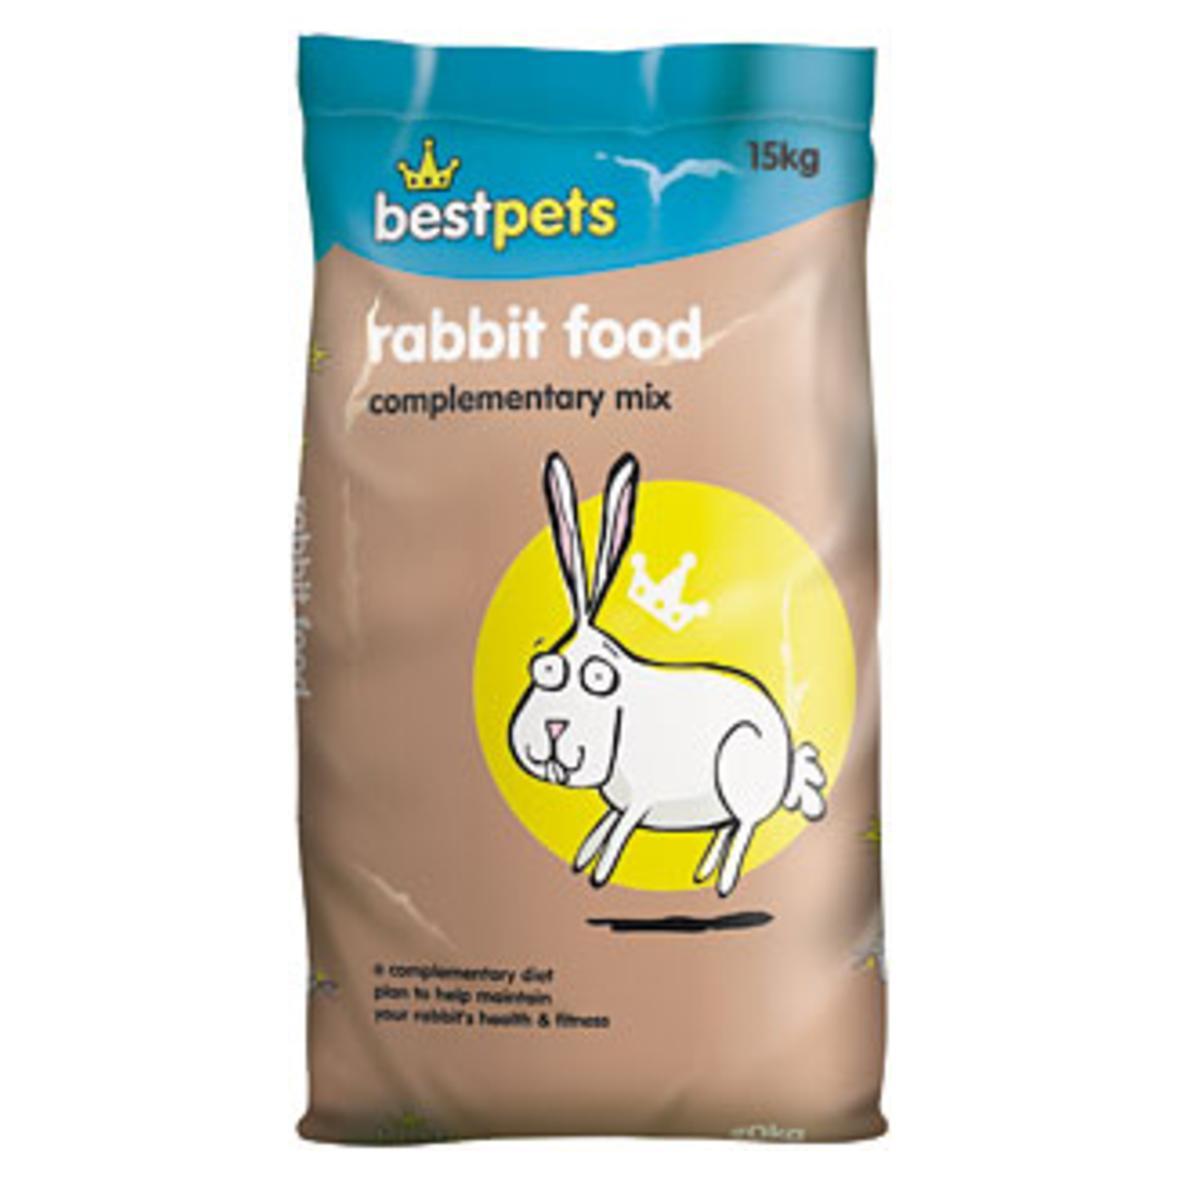 BestPets Rabbit Food 15kg